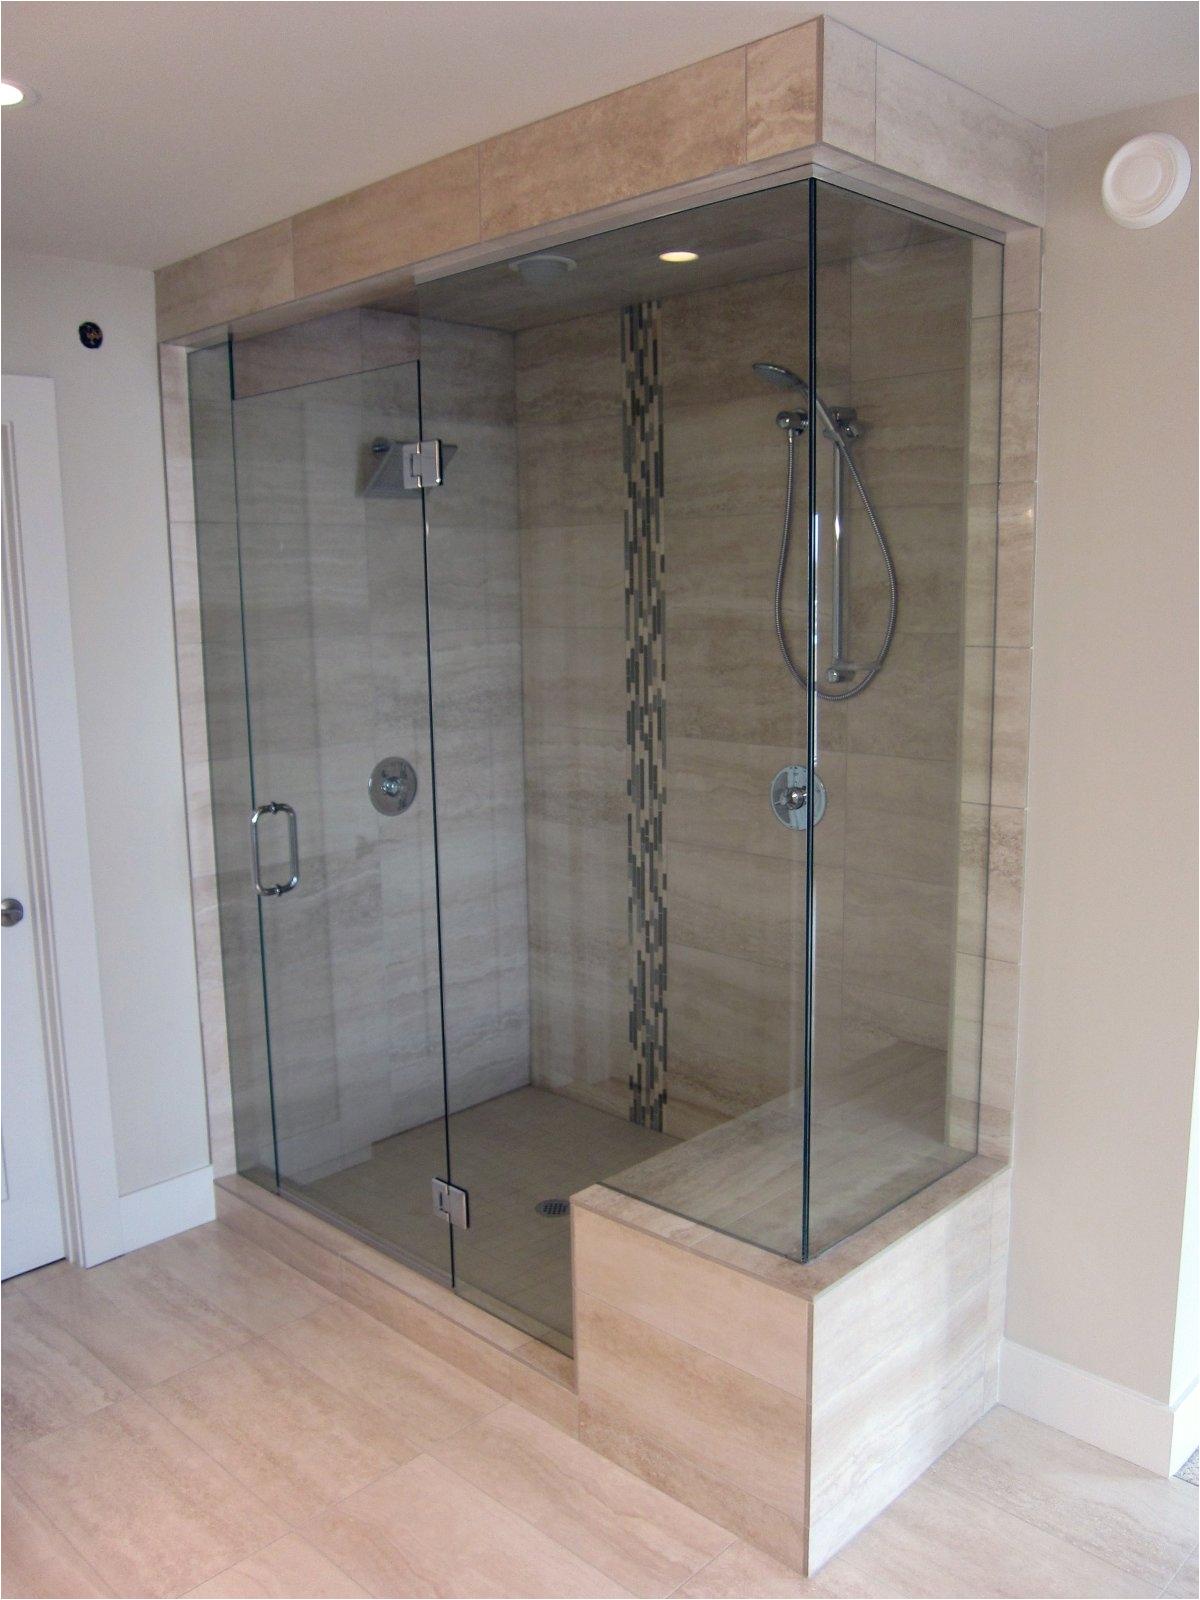 Bathtub Enclosures with Window Houseofmirrors Bathroom